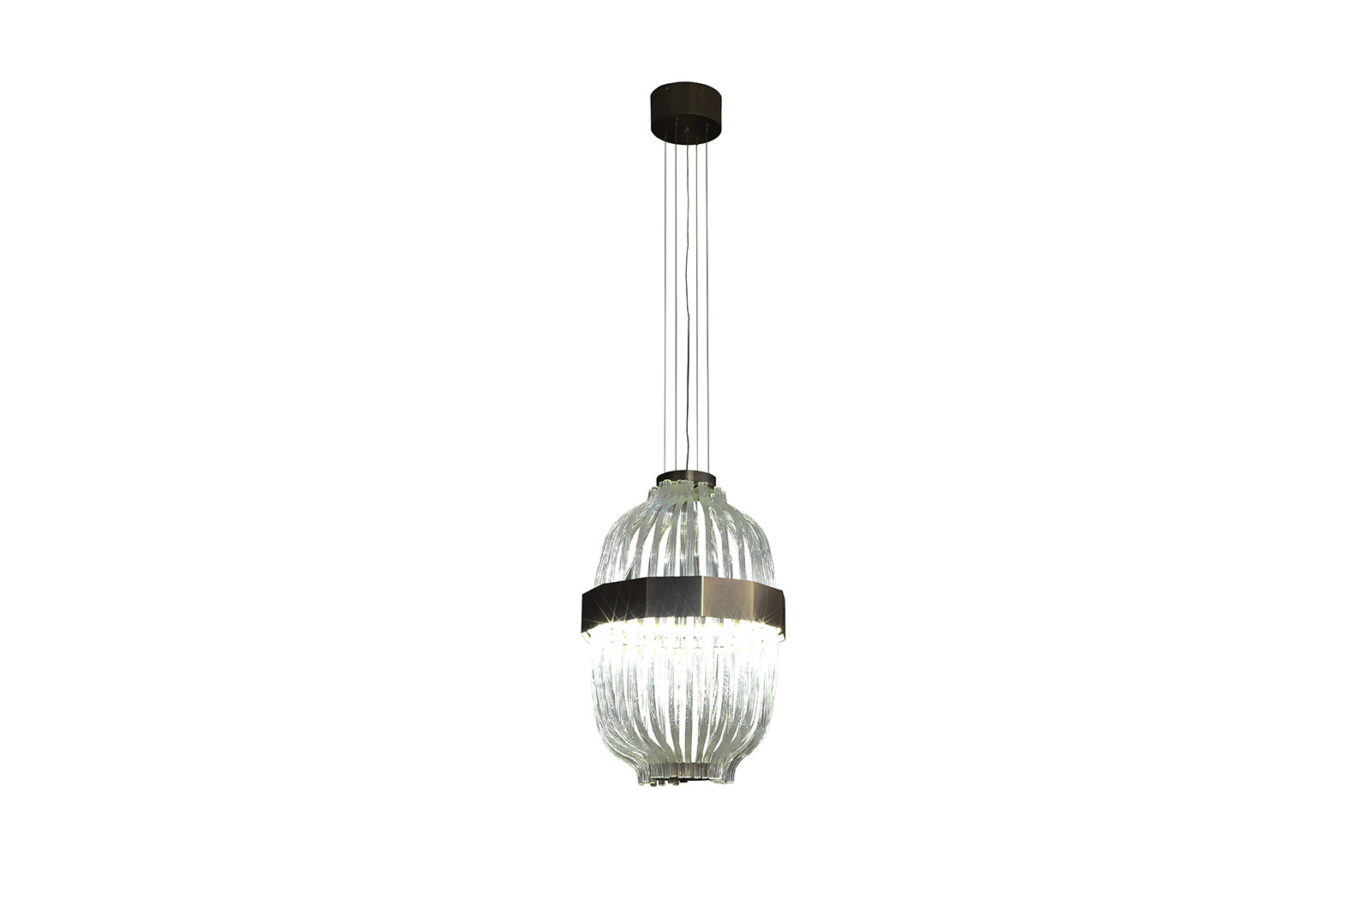 Wicker Suspension Lamp 2